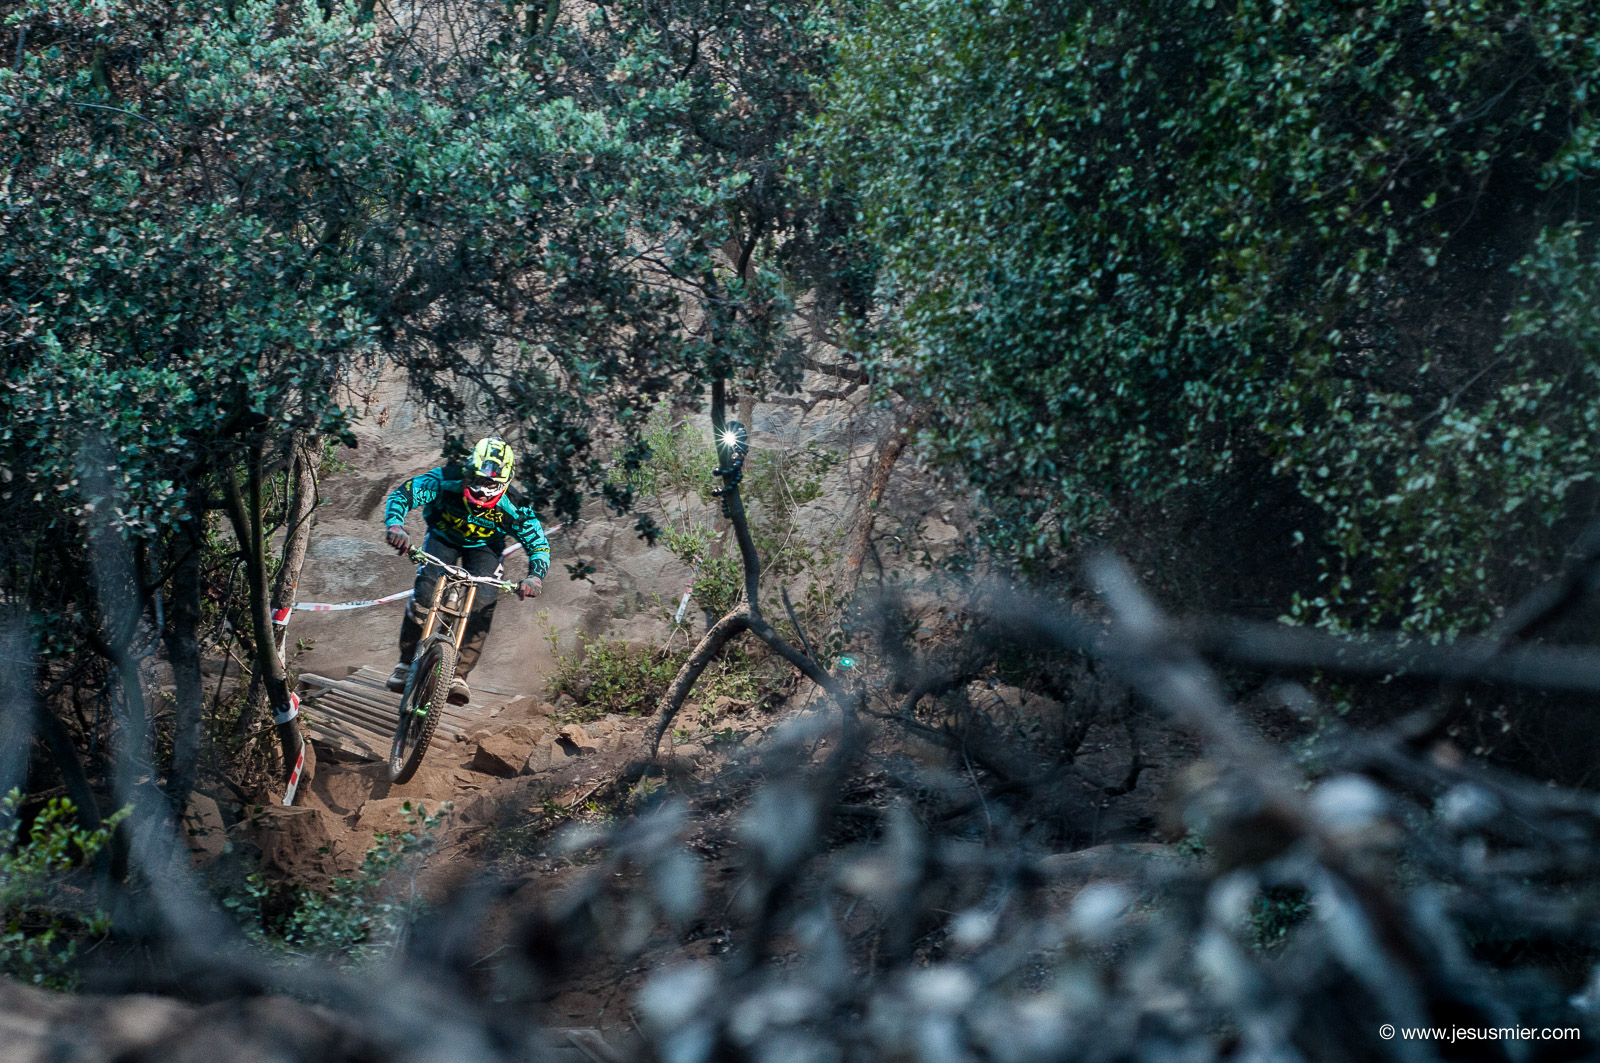 Rocatemu 2015, Rider: Jorge Monzon - Foto: Jesus Mier